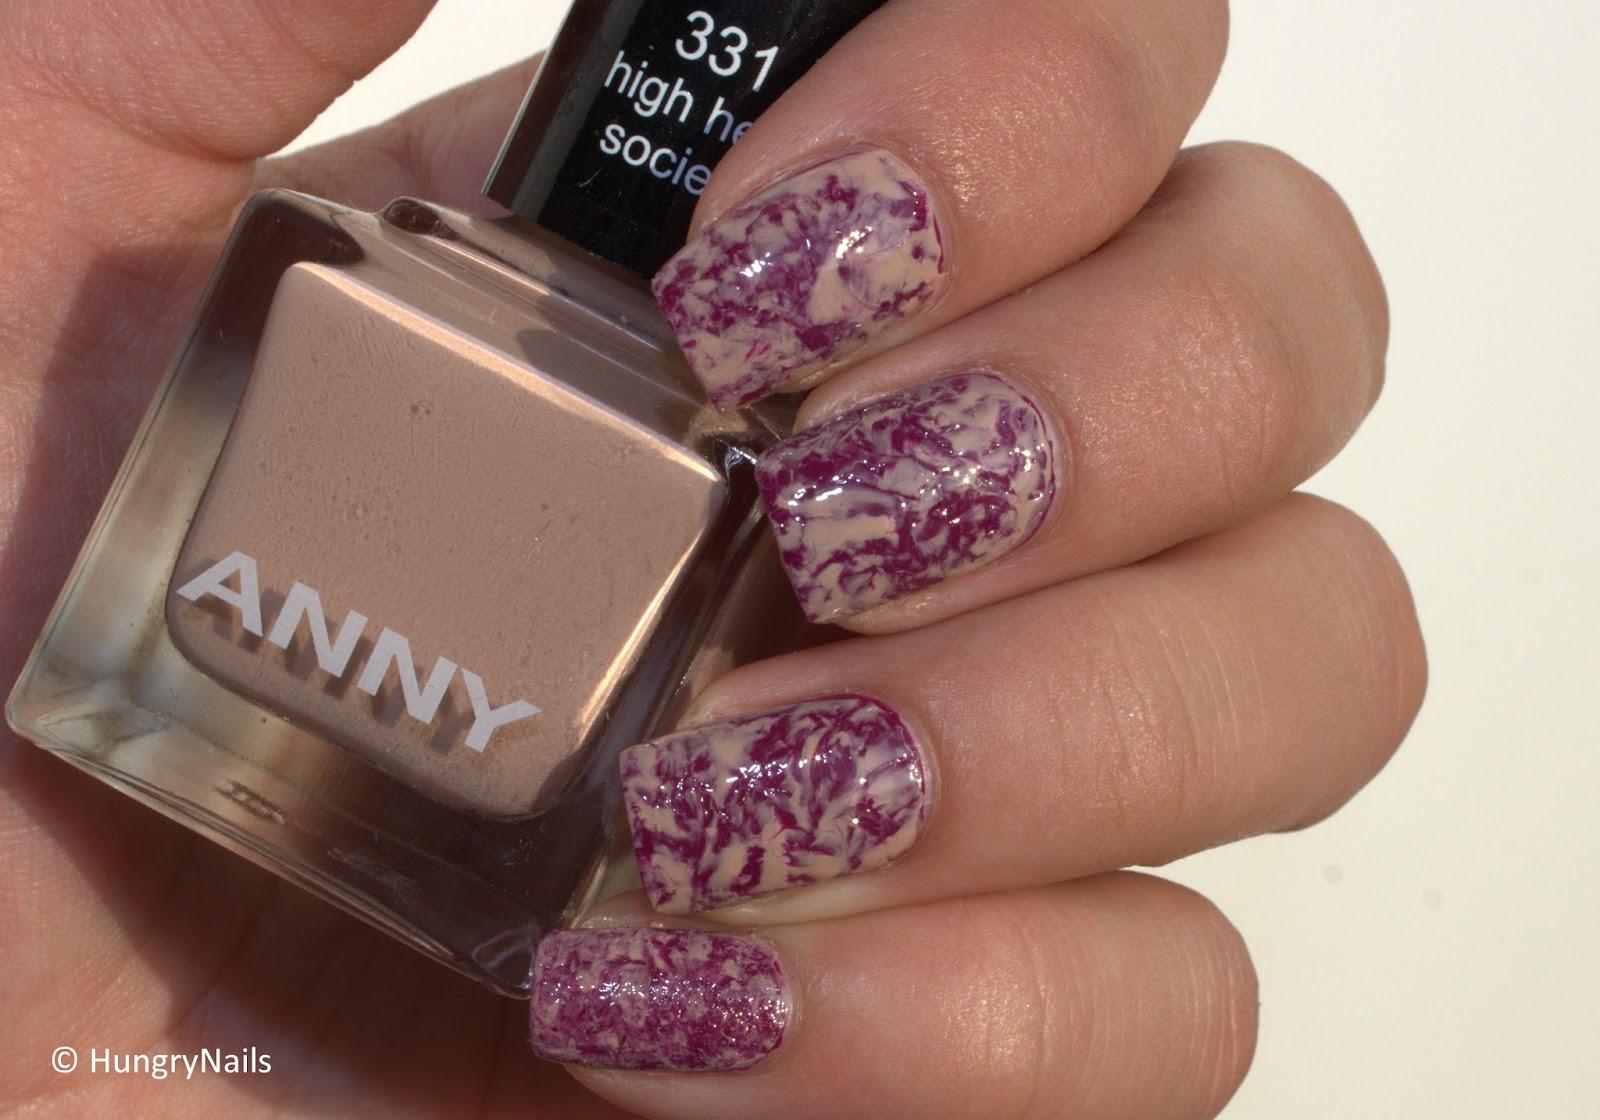 http://hungrynails.blogspot.de/2014/09/nail-art-saran-wrap-nails-mit-anny.html